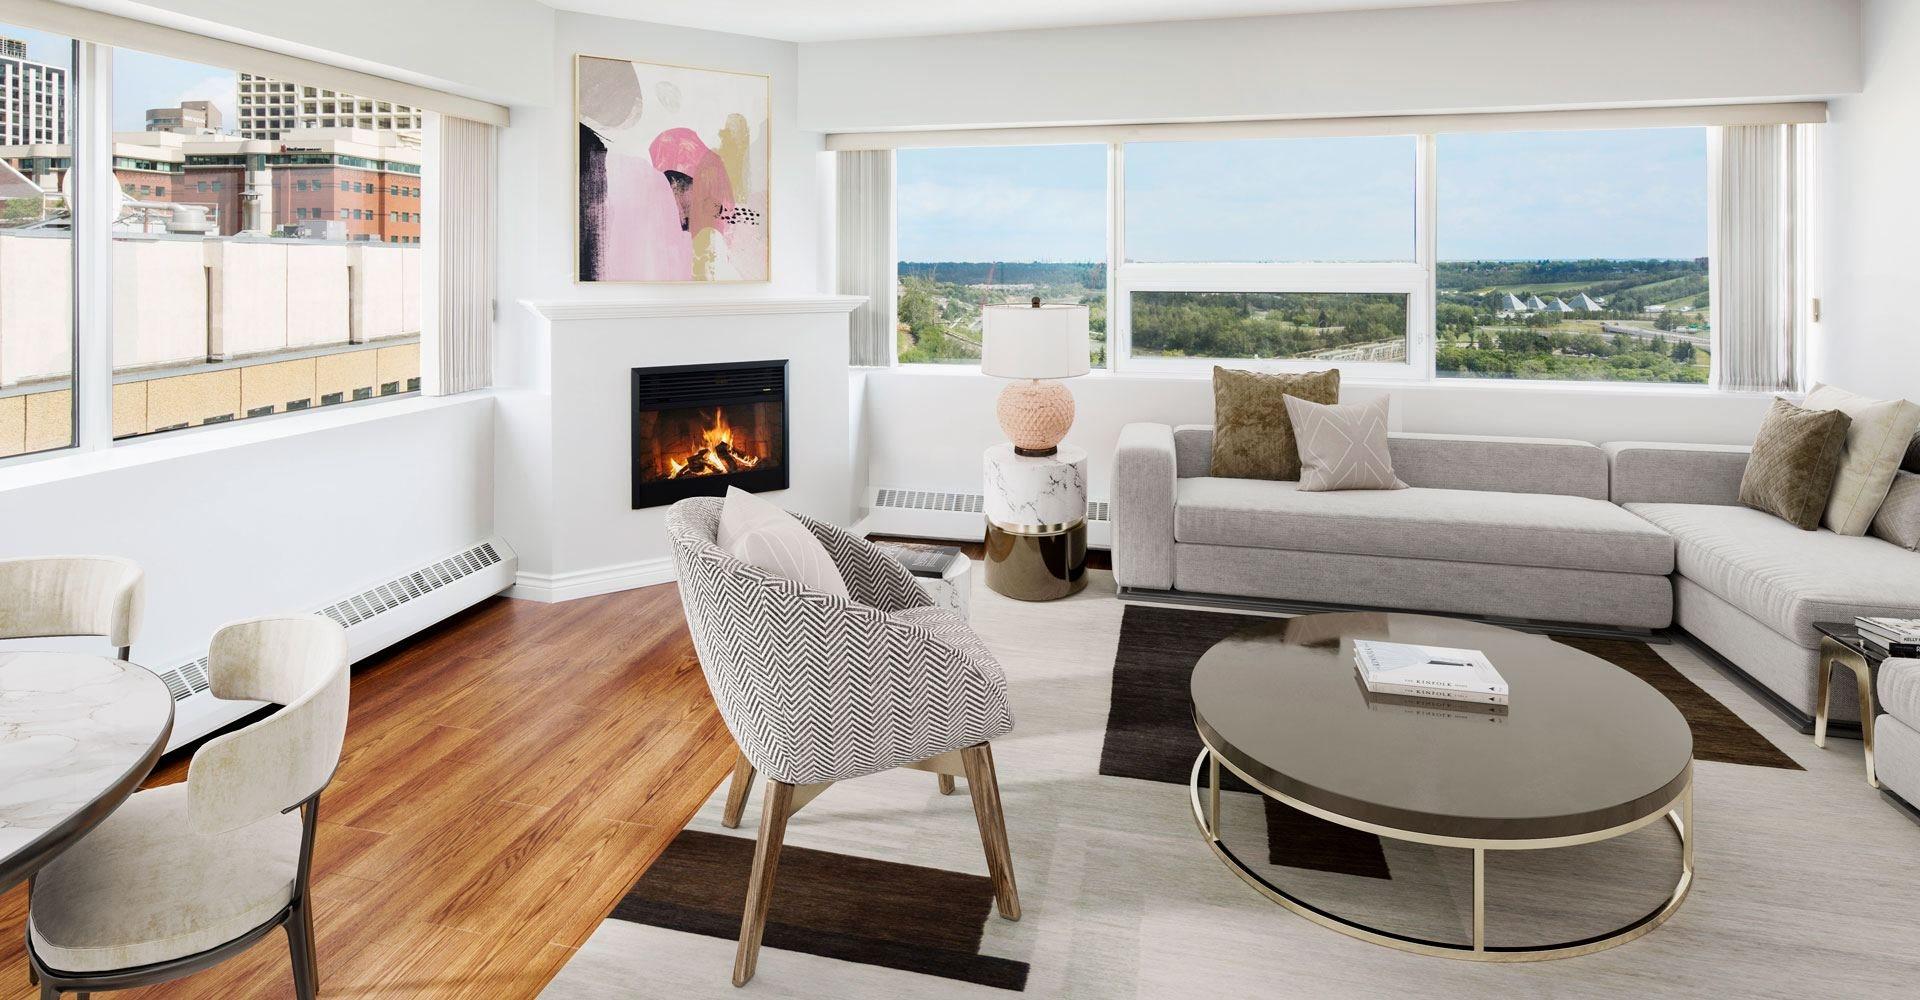 Livingroom with a sofa, table, area rug, and a fireplace